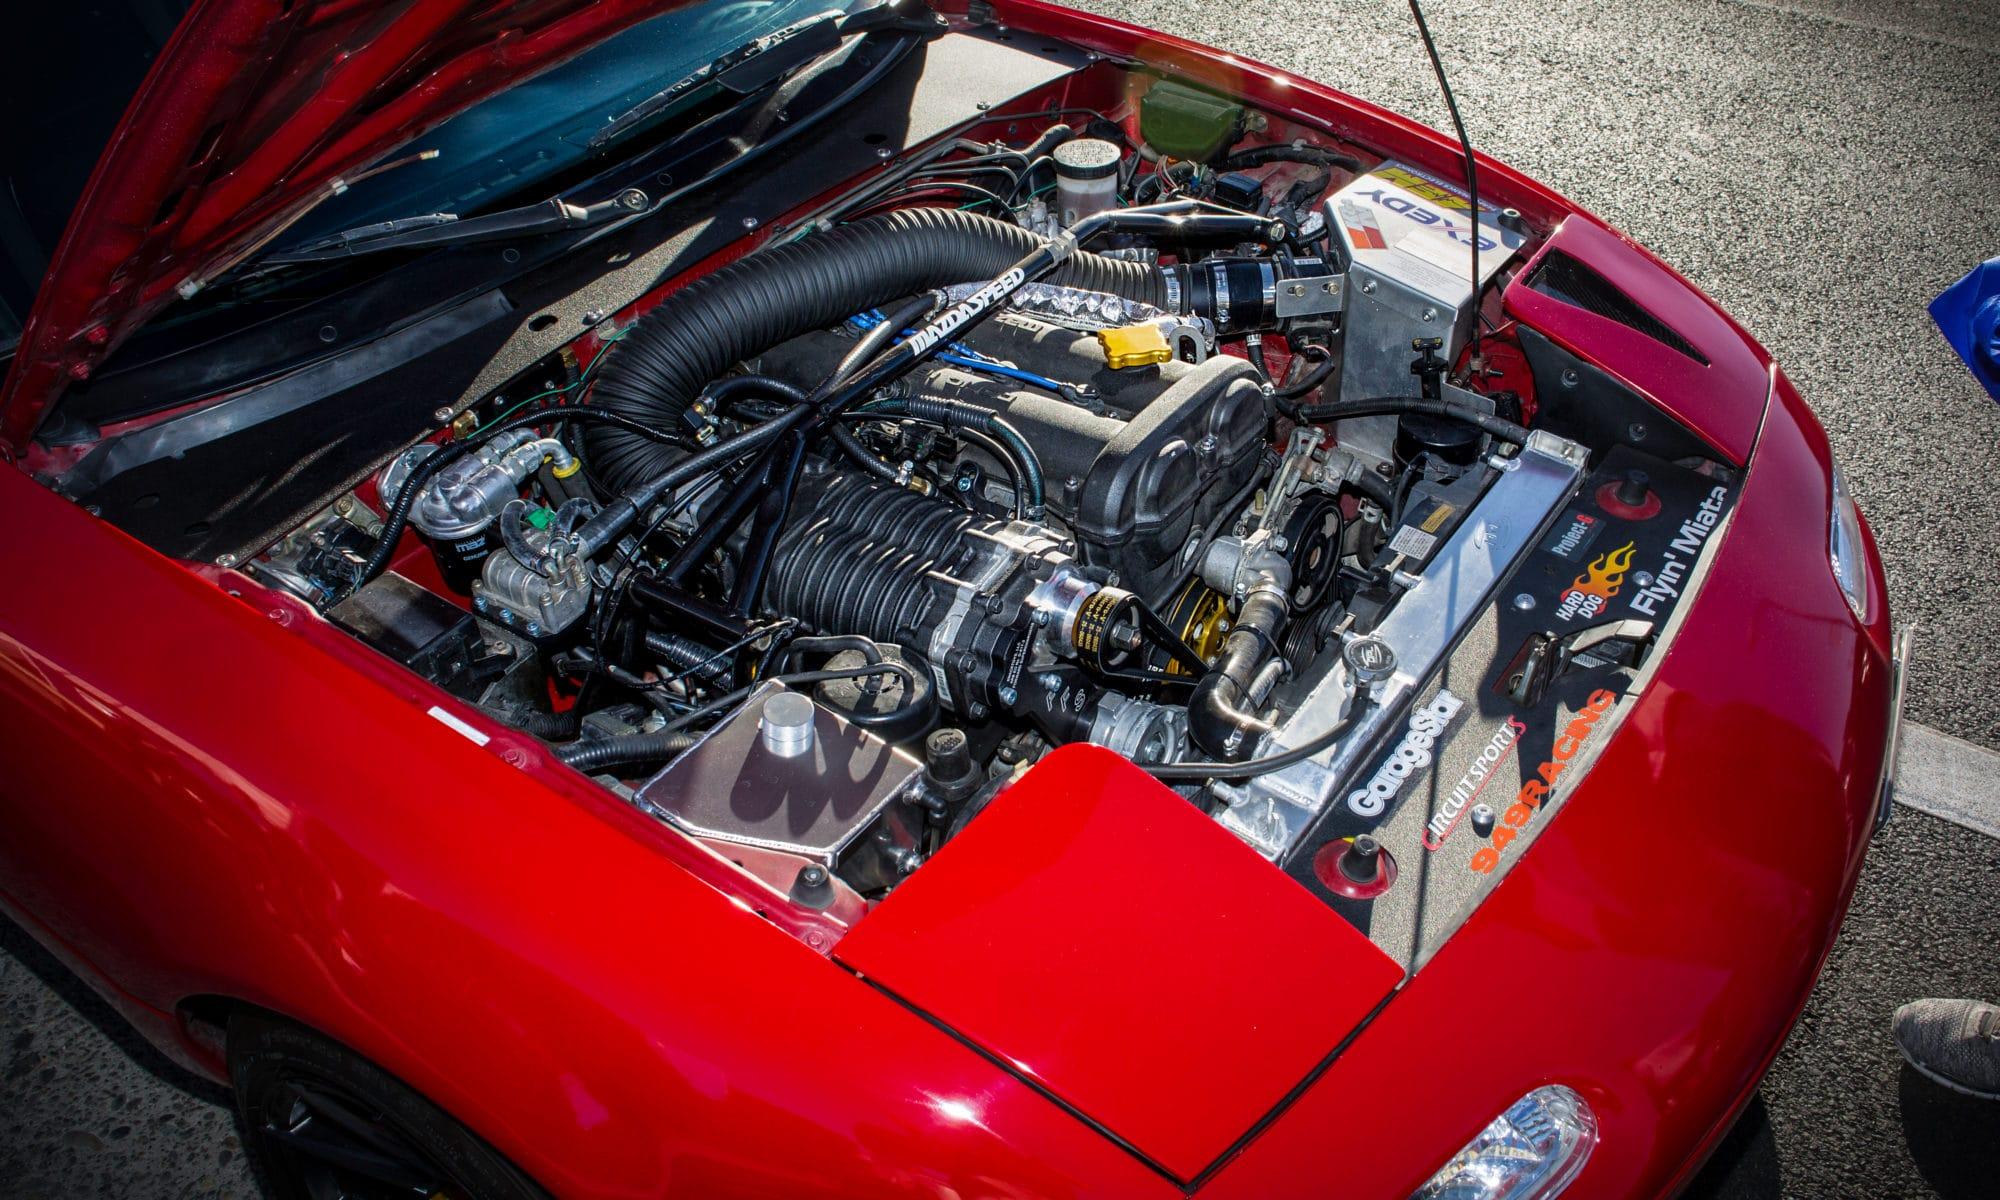 Best Miata Radiators: Performance Upgrades & Cheap Replacements